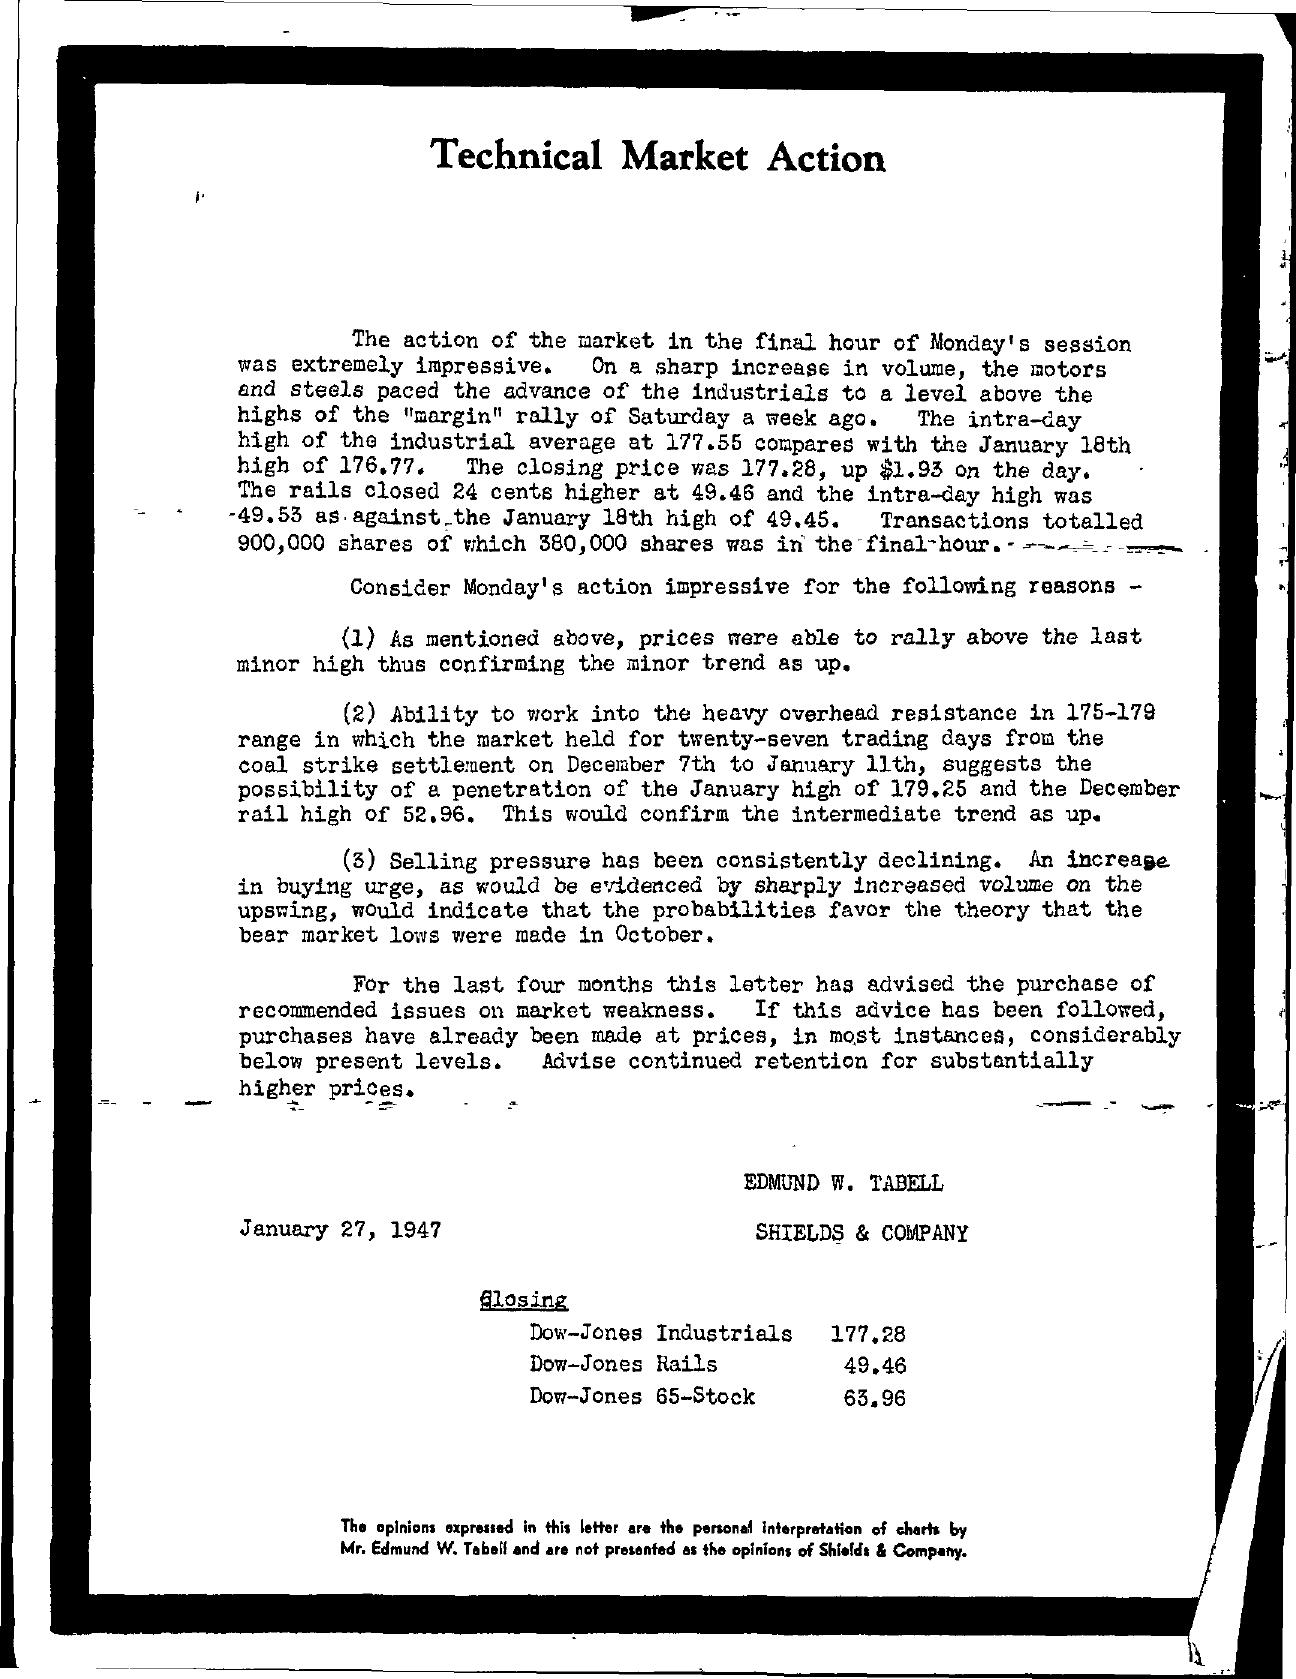 Tabell's Market Letter - January 27, 1947